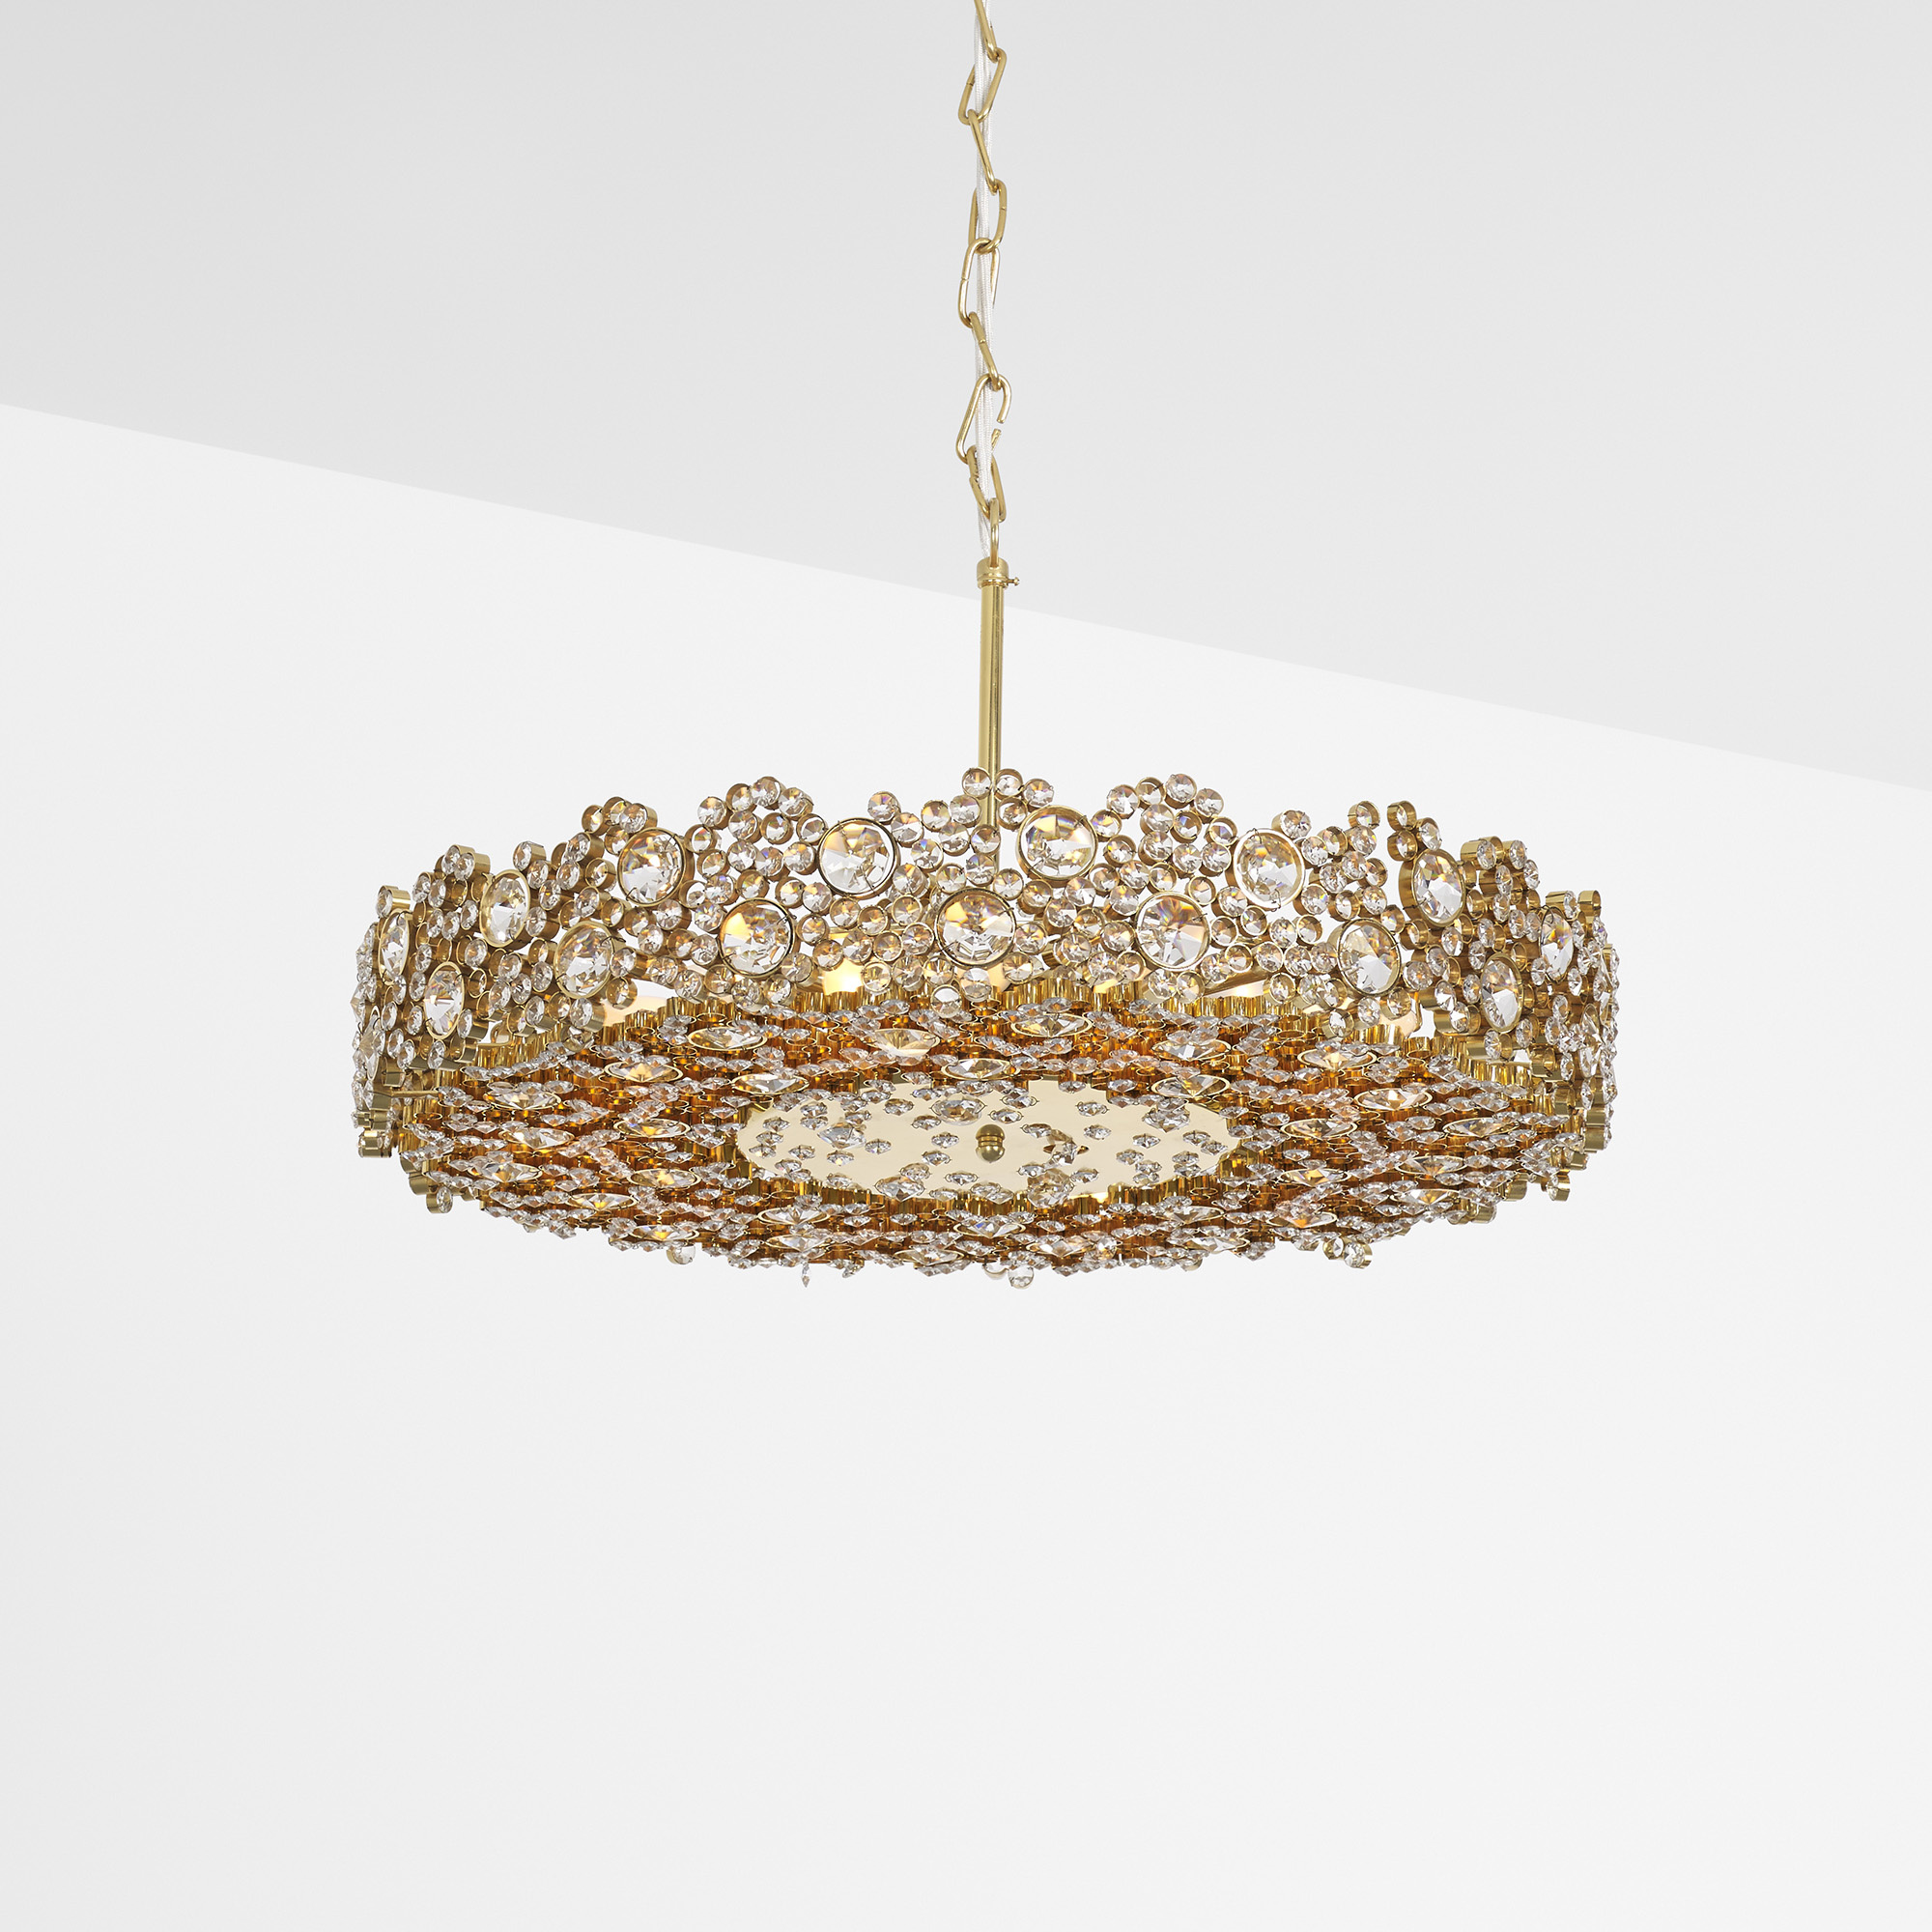 296 j amp l lobmeyr chandelier living contemporary 26 296 j l lobmeyr chandelier 1 of aloadofball Image collections